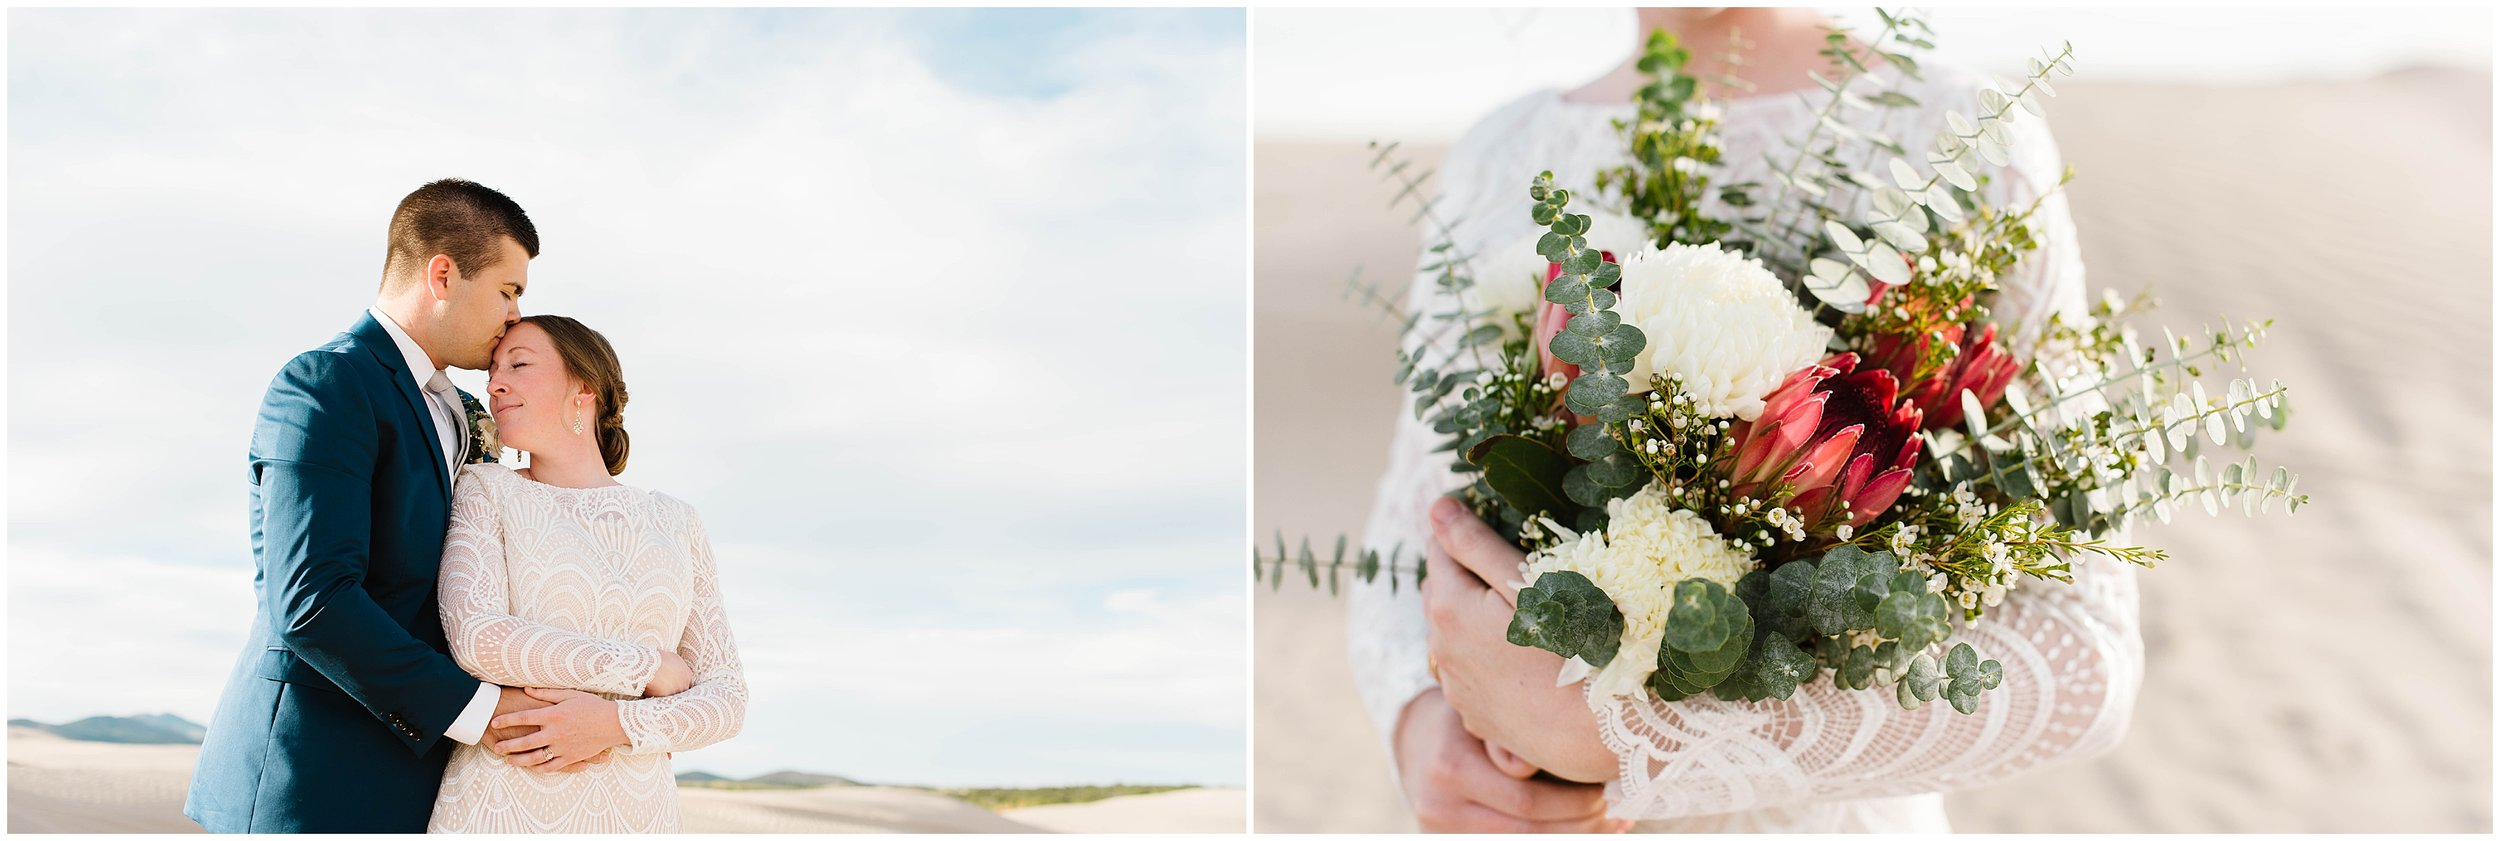 little-sahara-sand-dunes-wedding-amber-lynne-photography.jpg13.jpg